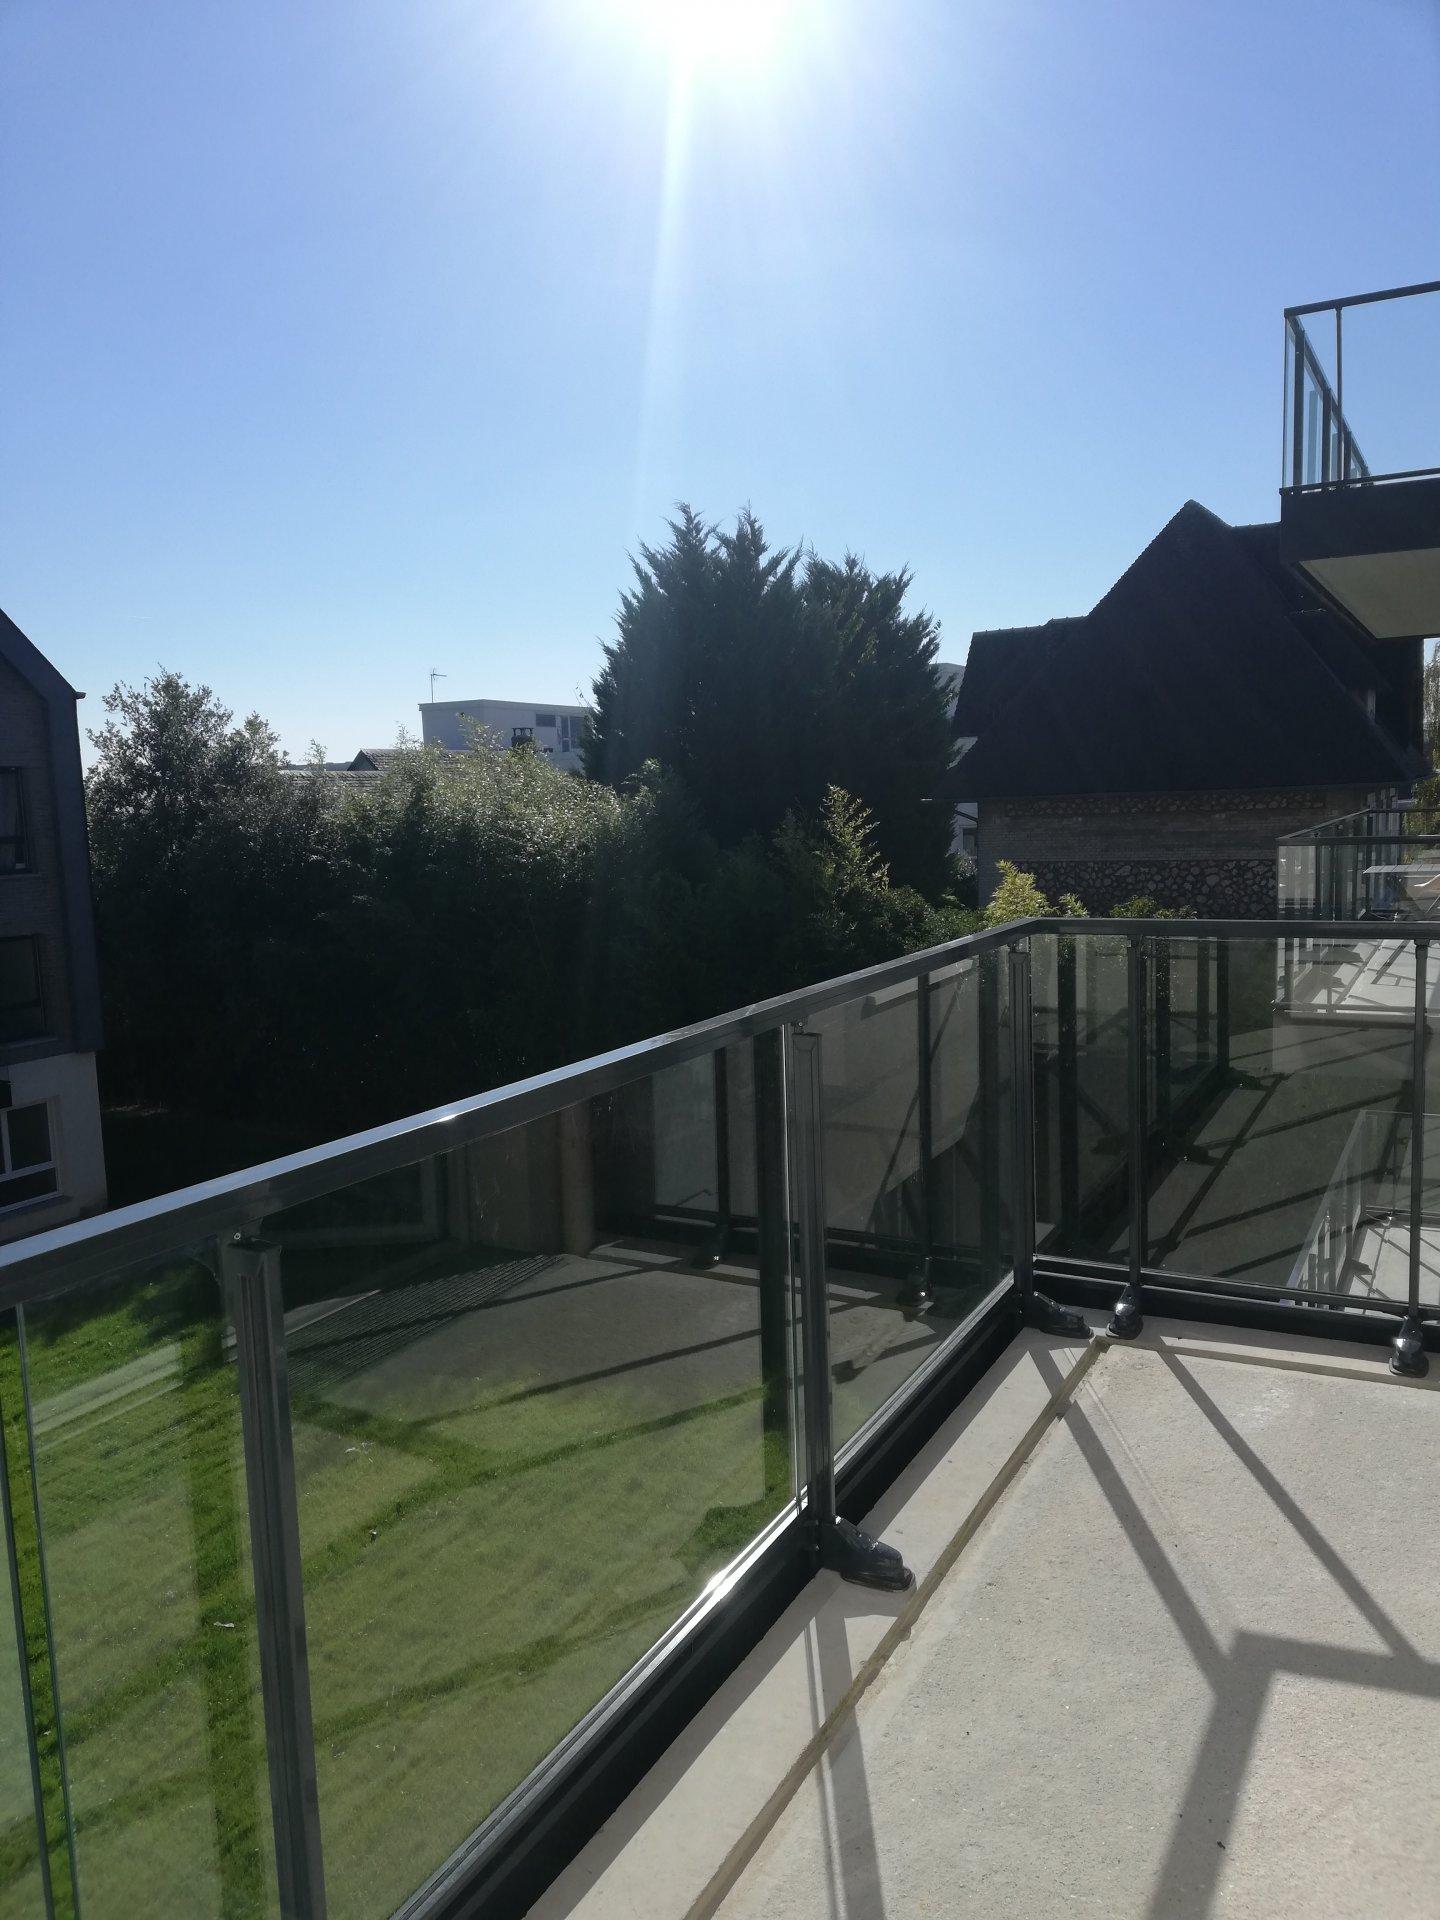 T3 NEUF avec balcon - quartier Saint Antoine BOIS-GUILLAUME